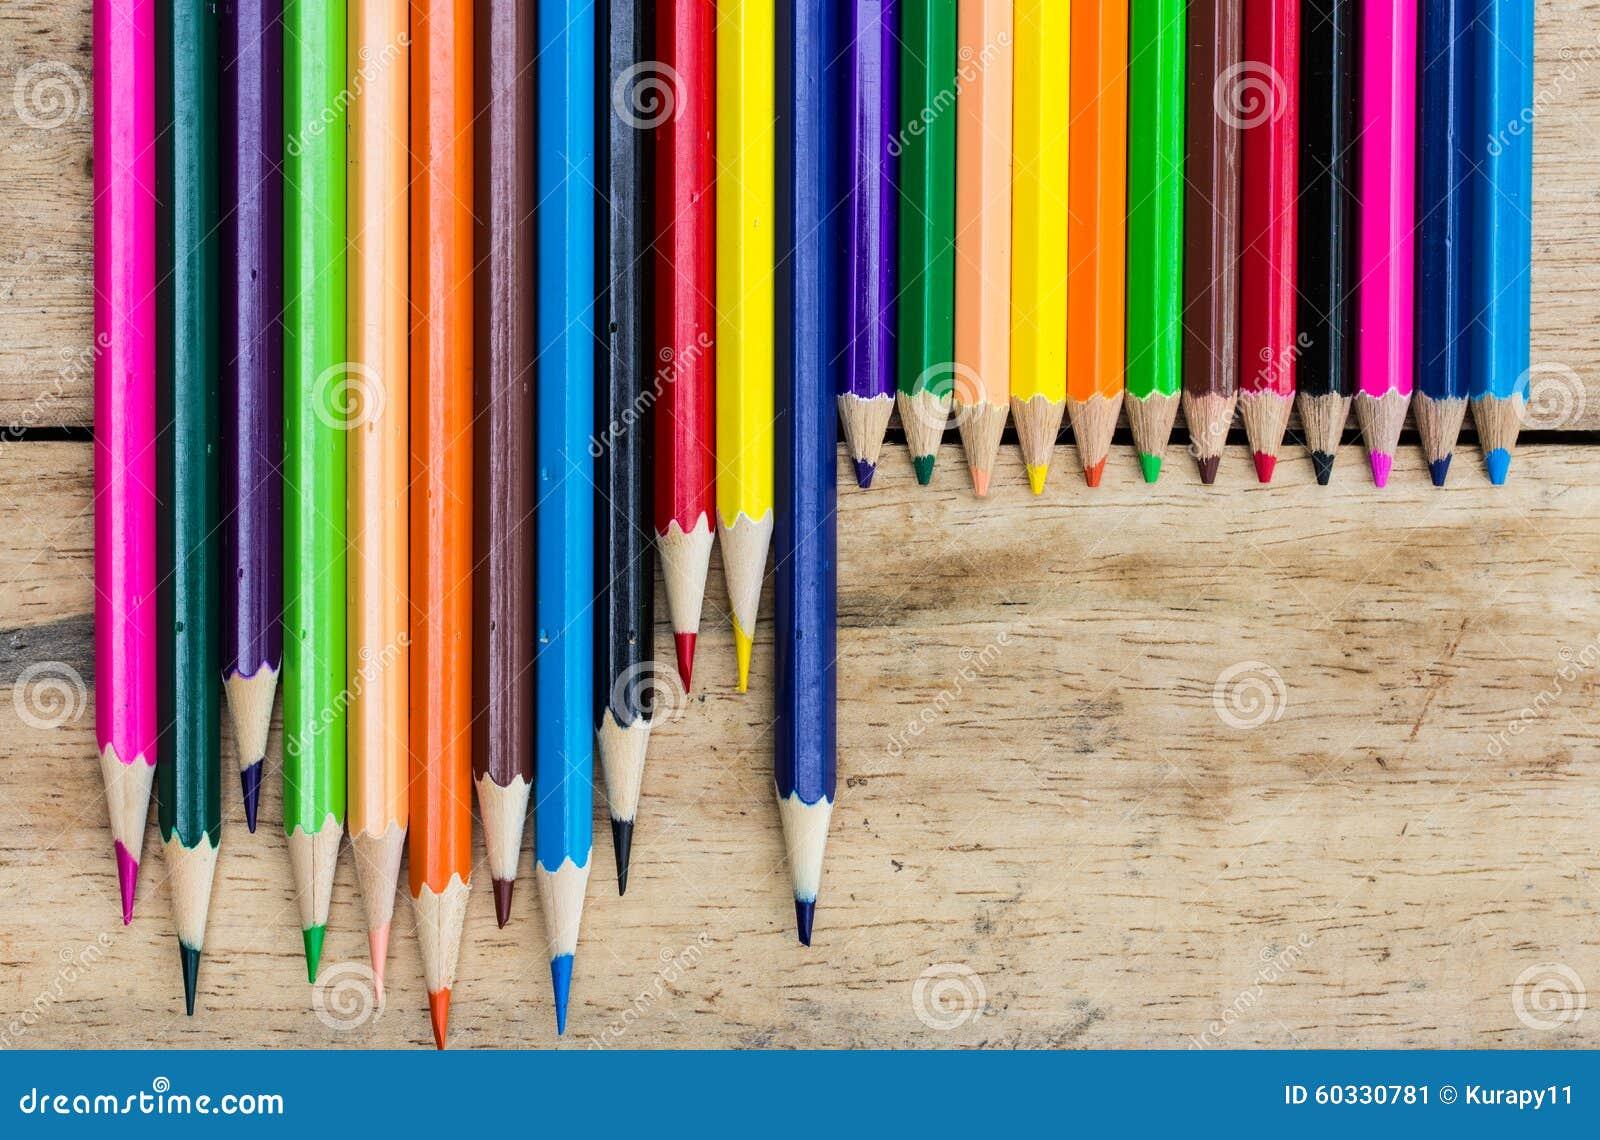 Coloured pencils on wood